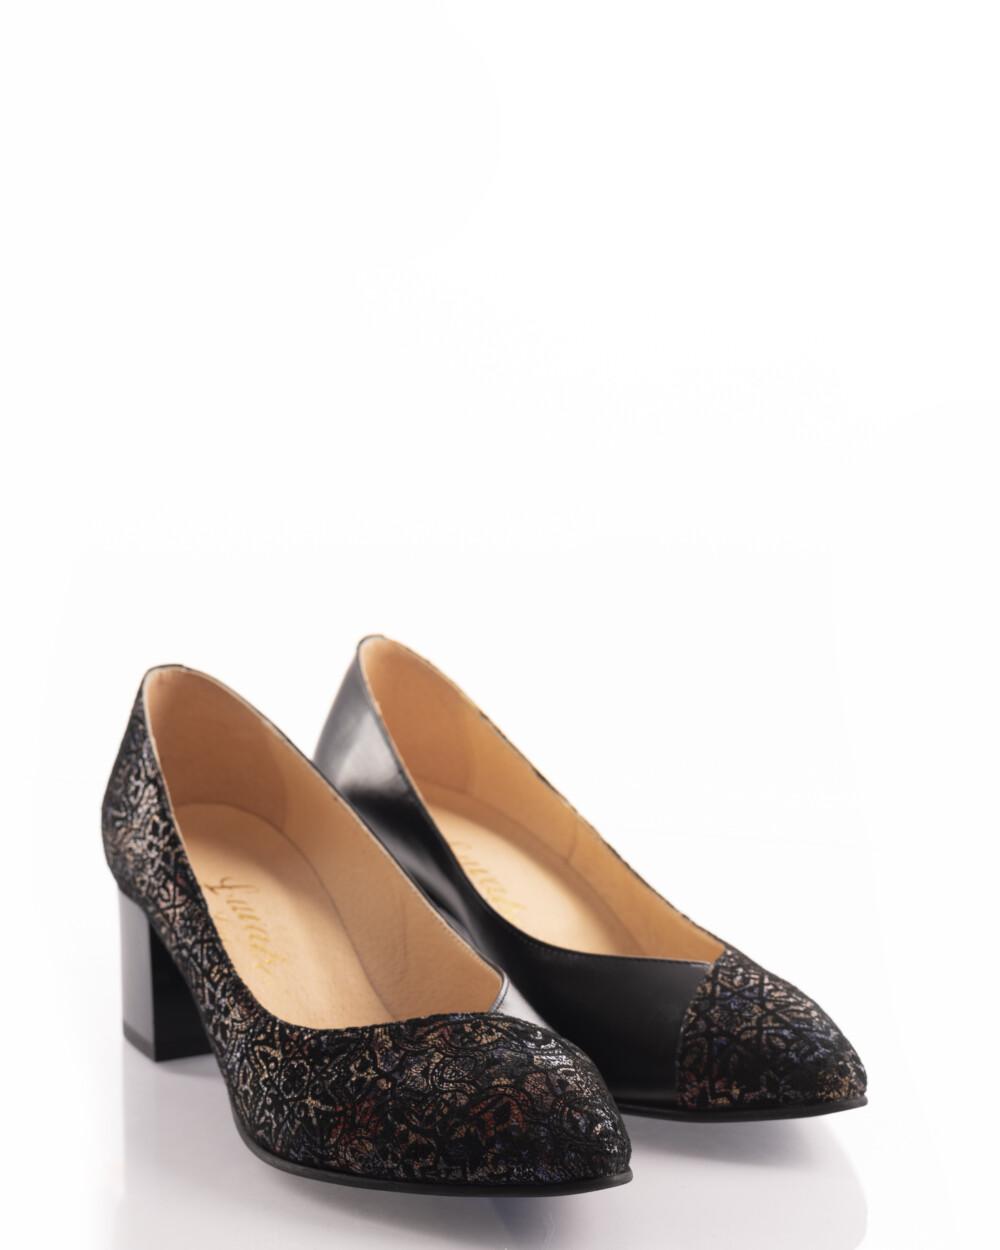 pantofi din piele naturala negru